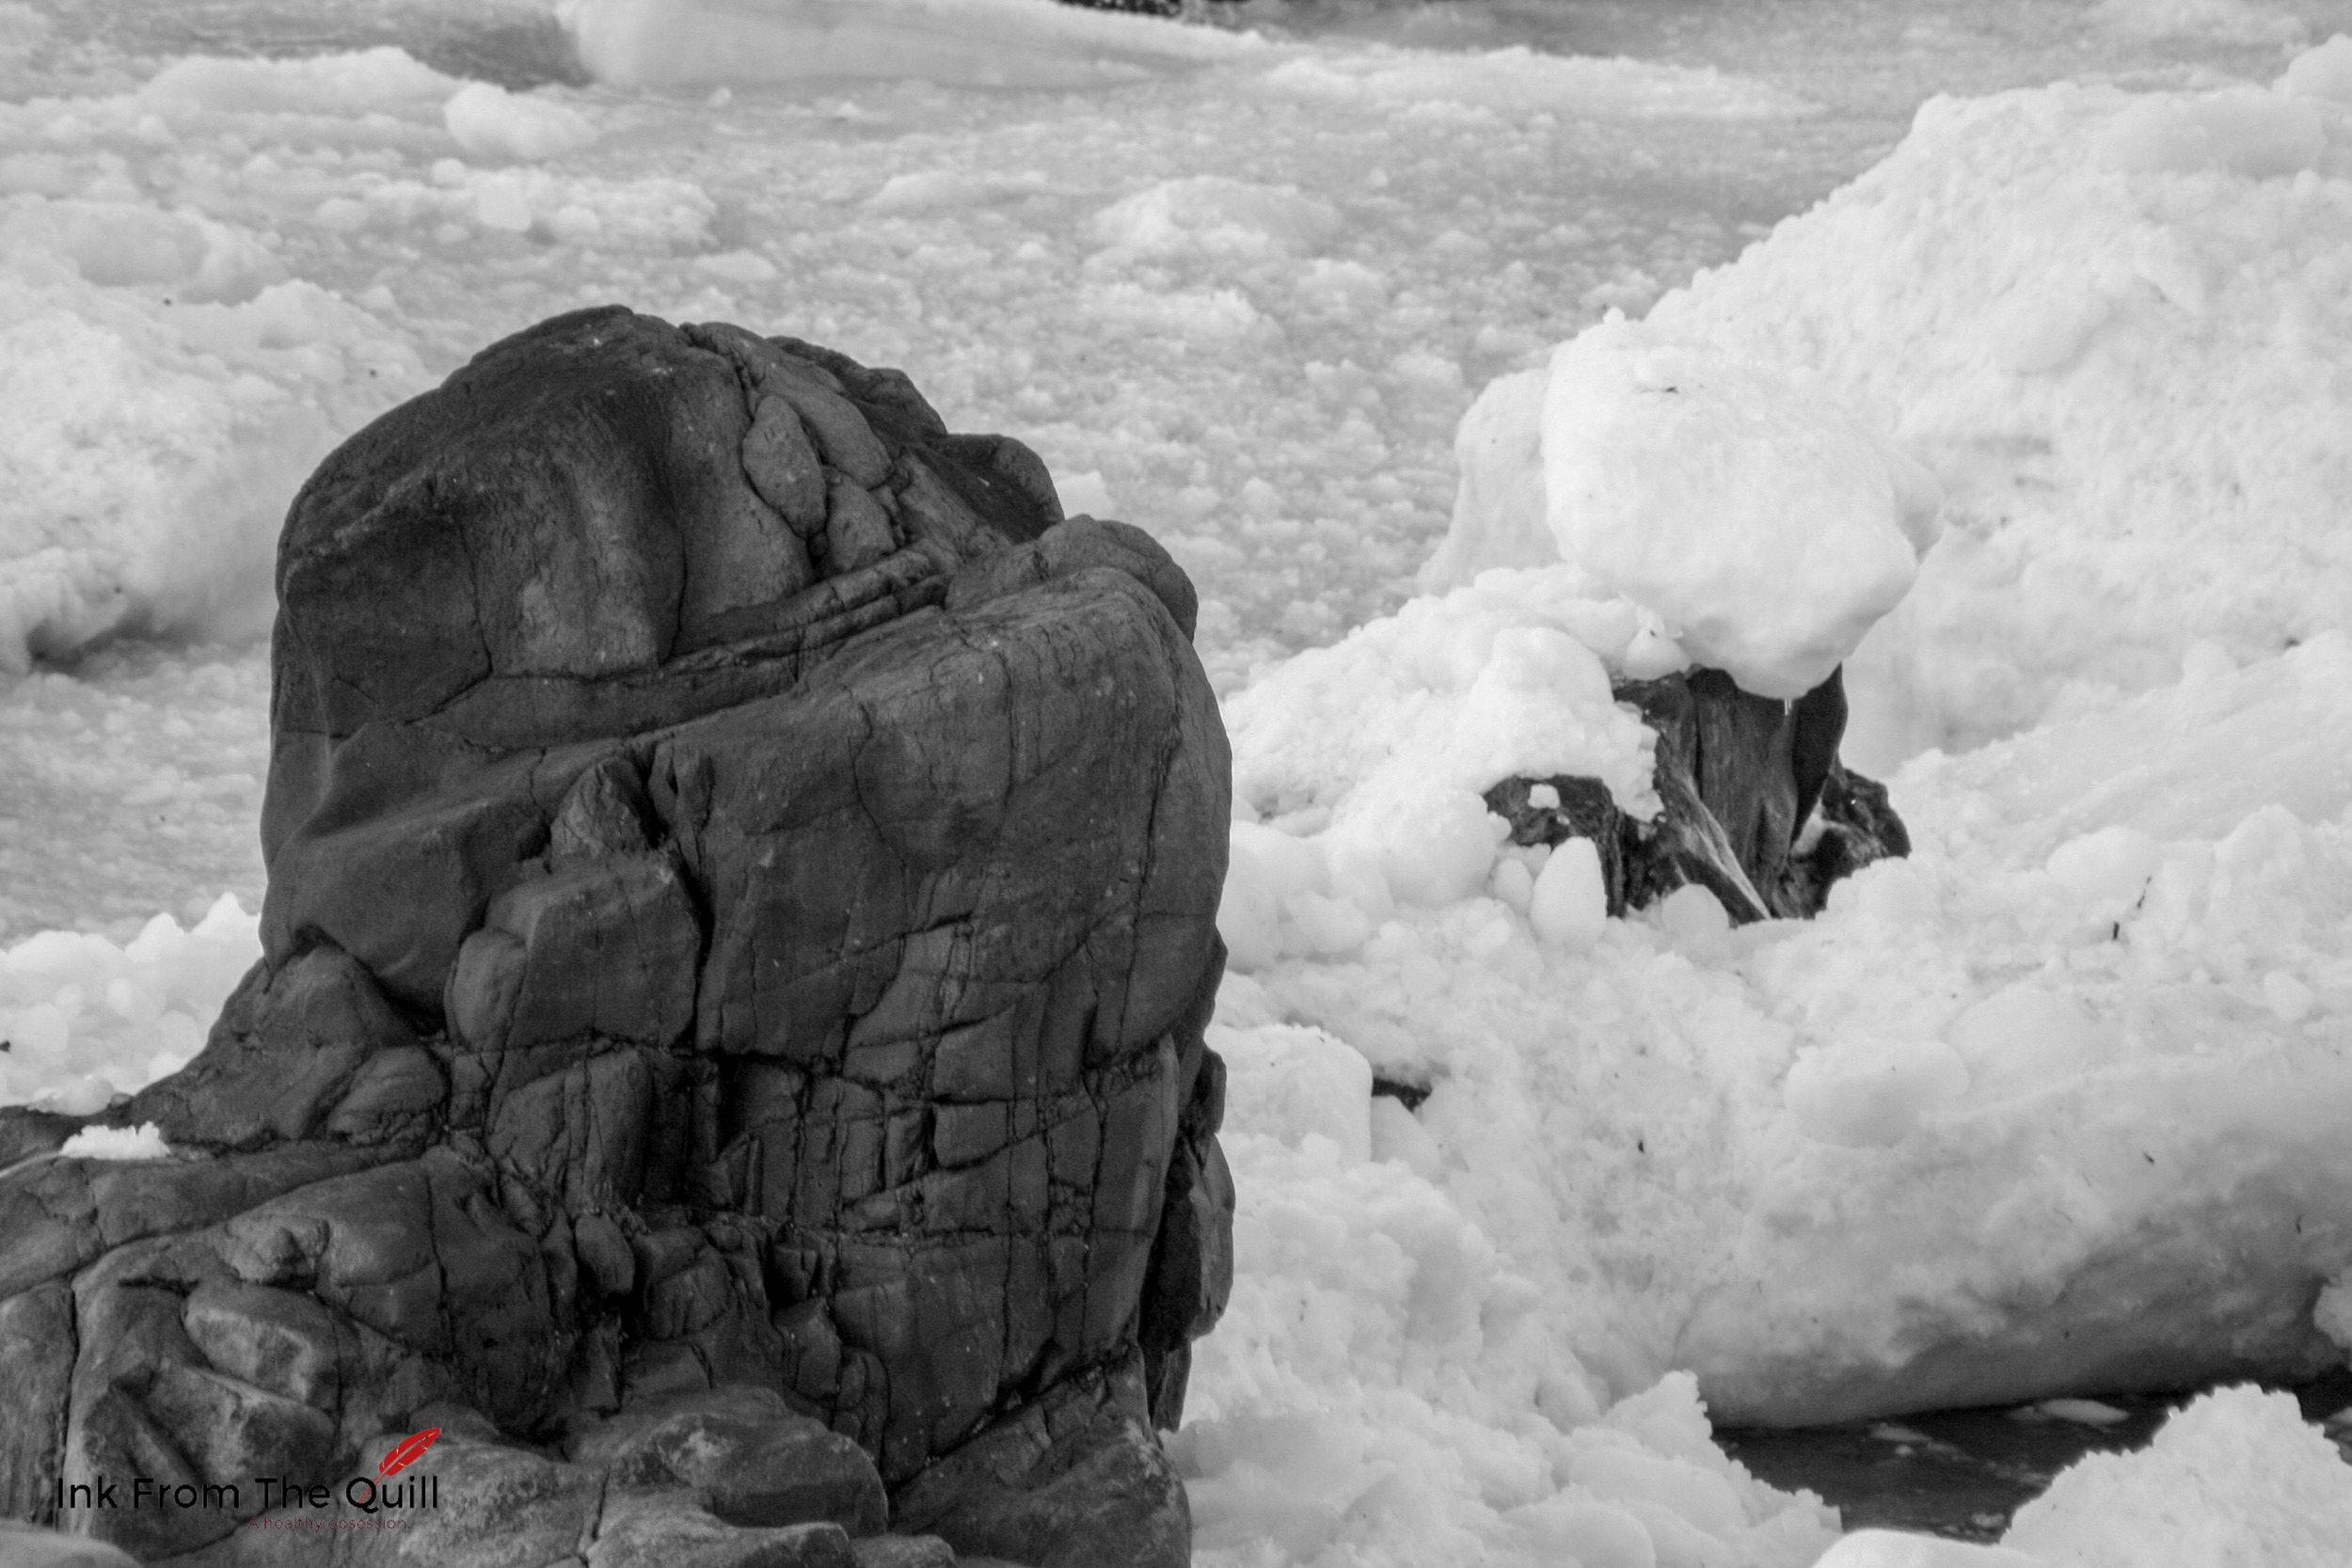 Sea ice in Blackhead, Cape Spear, Newfoundland